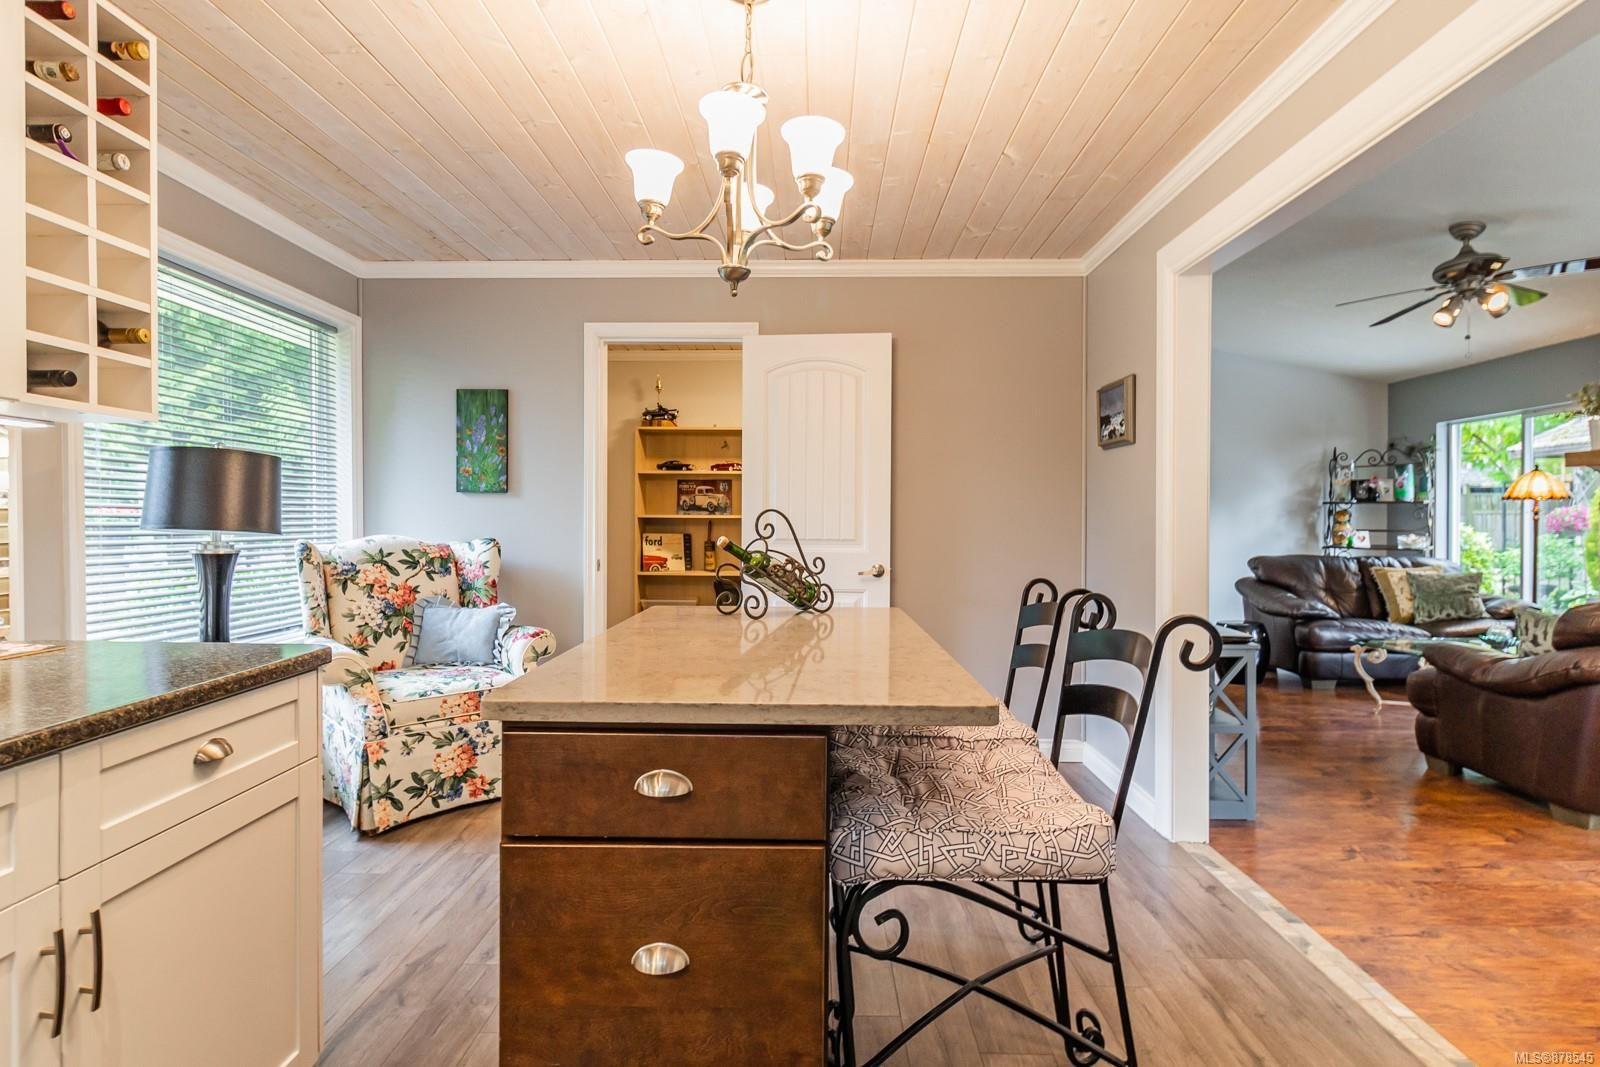 Photo 17: Photos: 1070 Symons Cres in : PQ Qualicum Beach House for sale (Parksville/Qualicum)  : MLS®# 878545